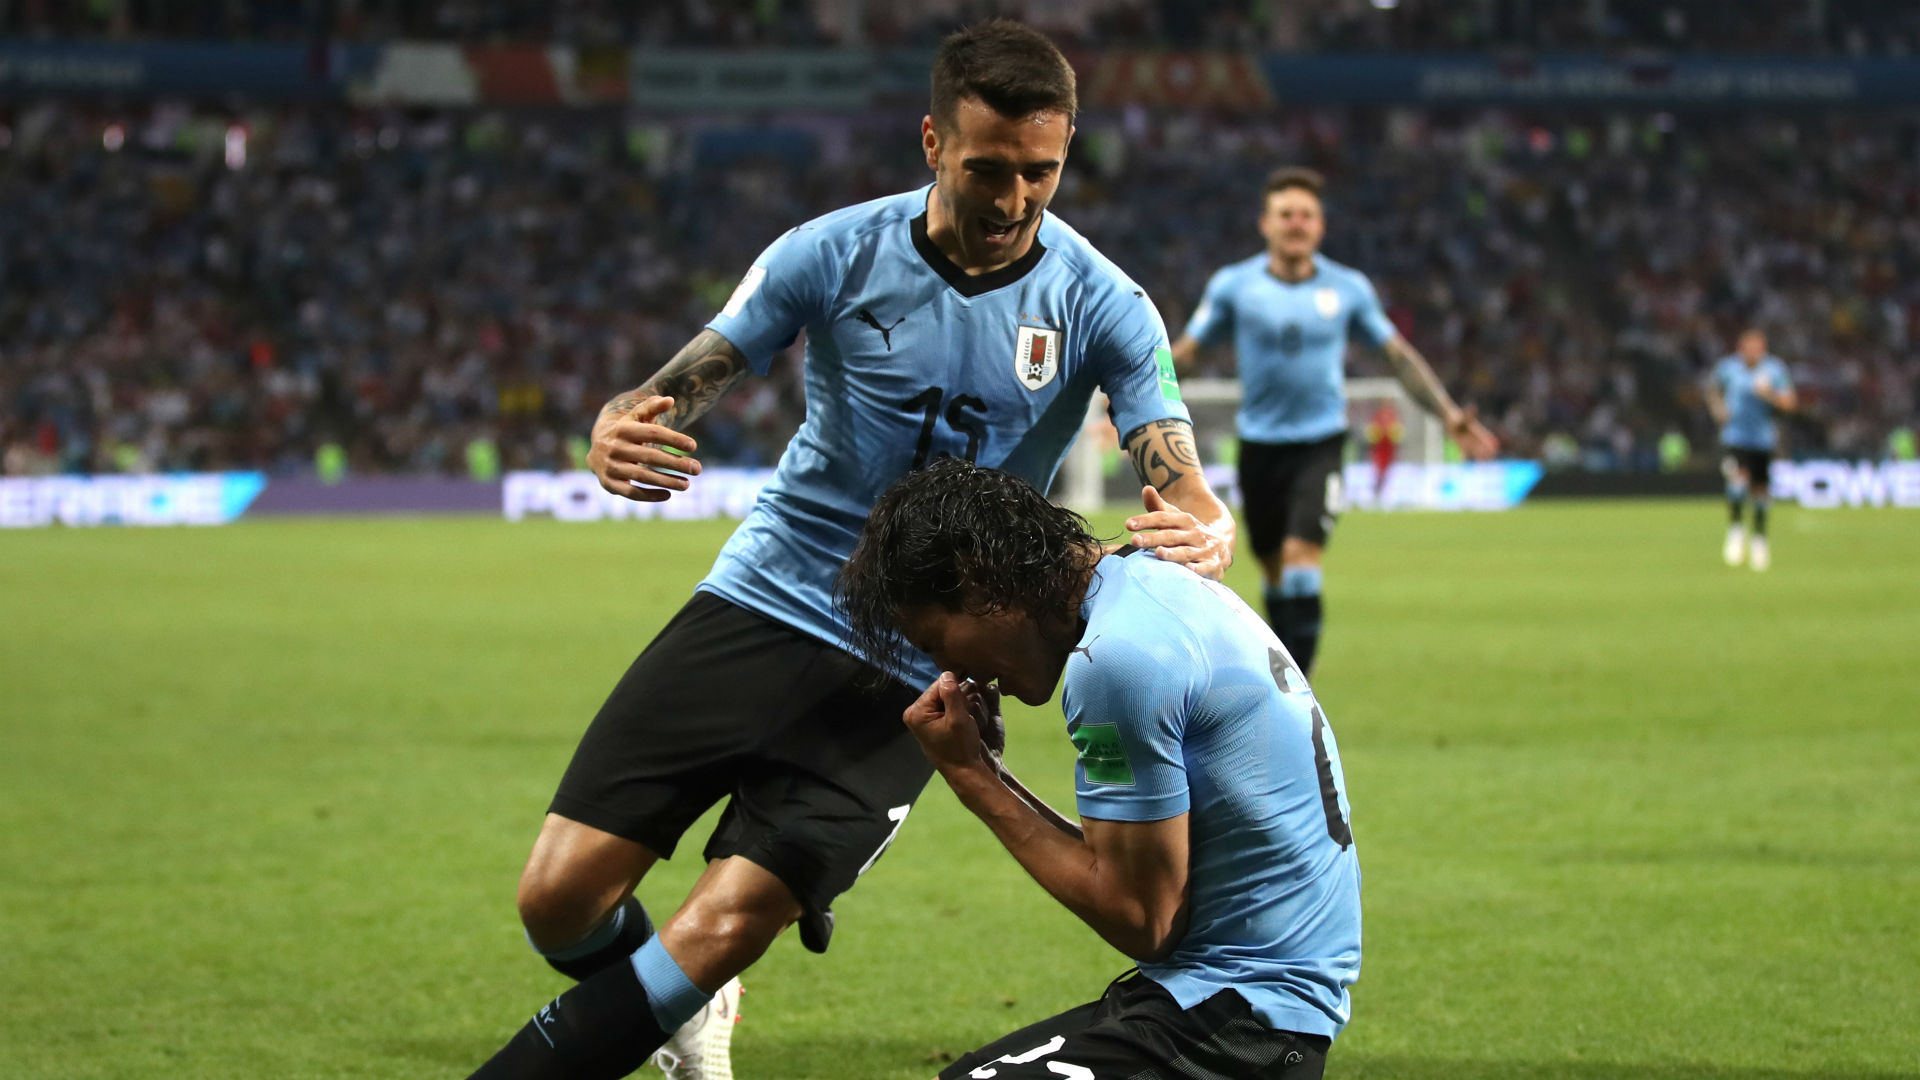 Edinson Cavani Matas Vecino Uruguay Portugal World Cup